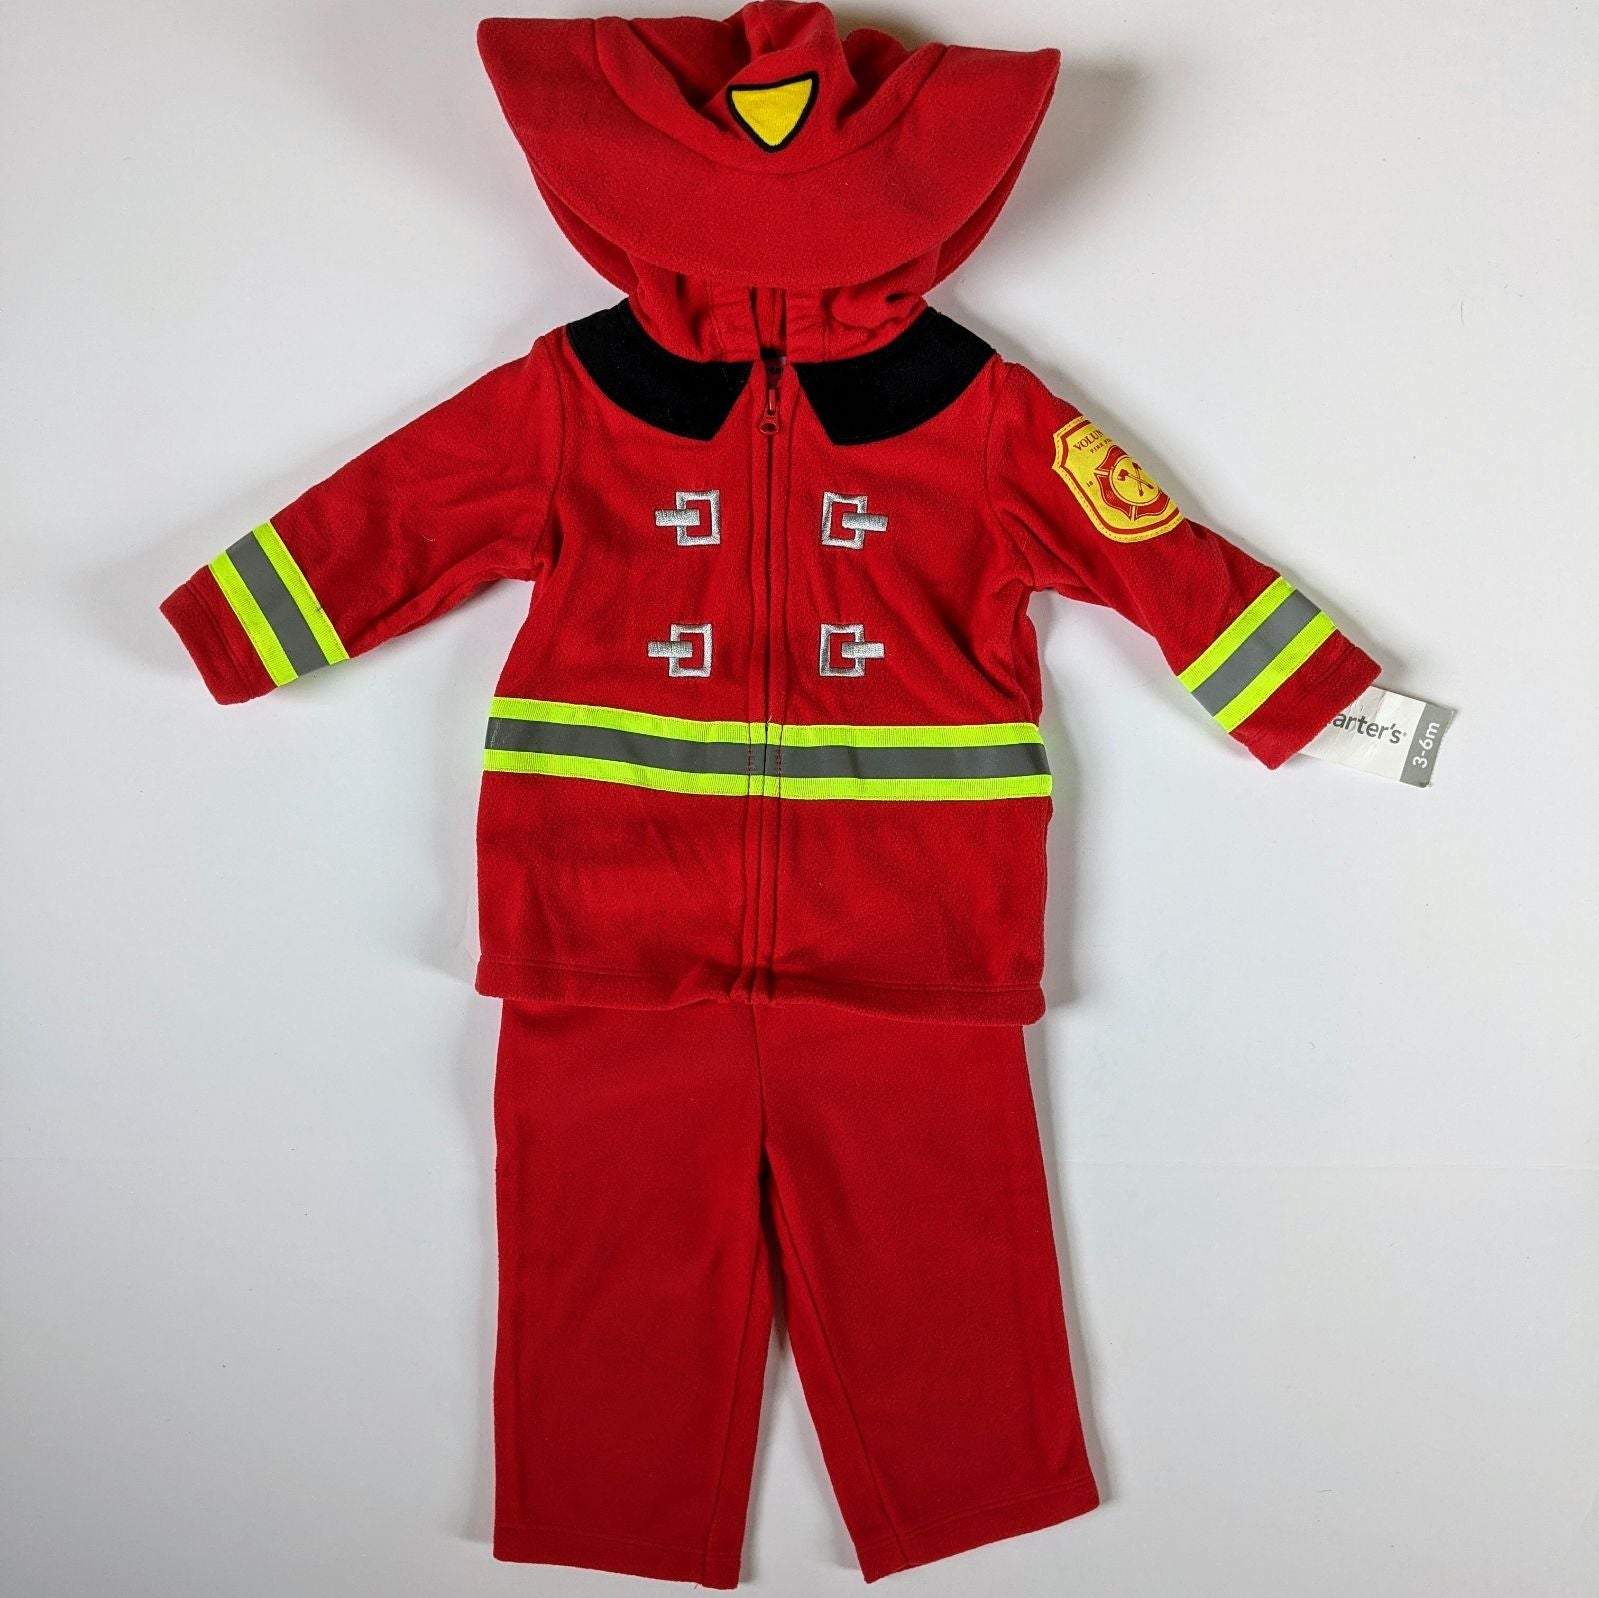 Firefighter Infant Halloween Costume